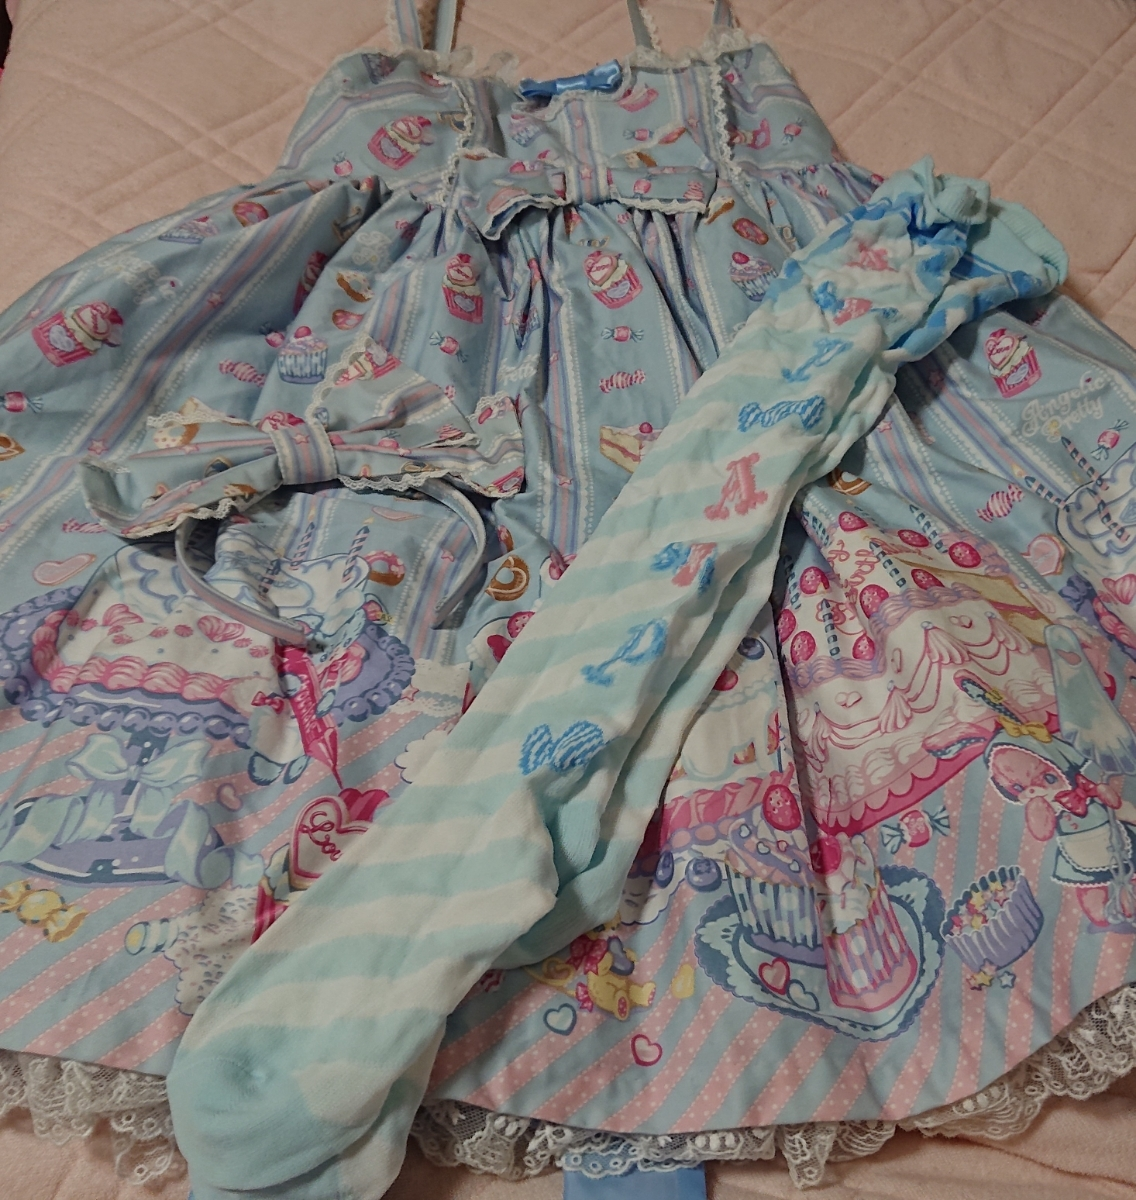 Angelic Pretty アンジェリックプリティ 2016年福袋 Whip Factory ジャンパースカートset サックス 開封済み未使用品 欠品あり